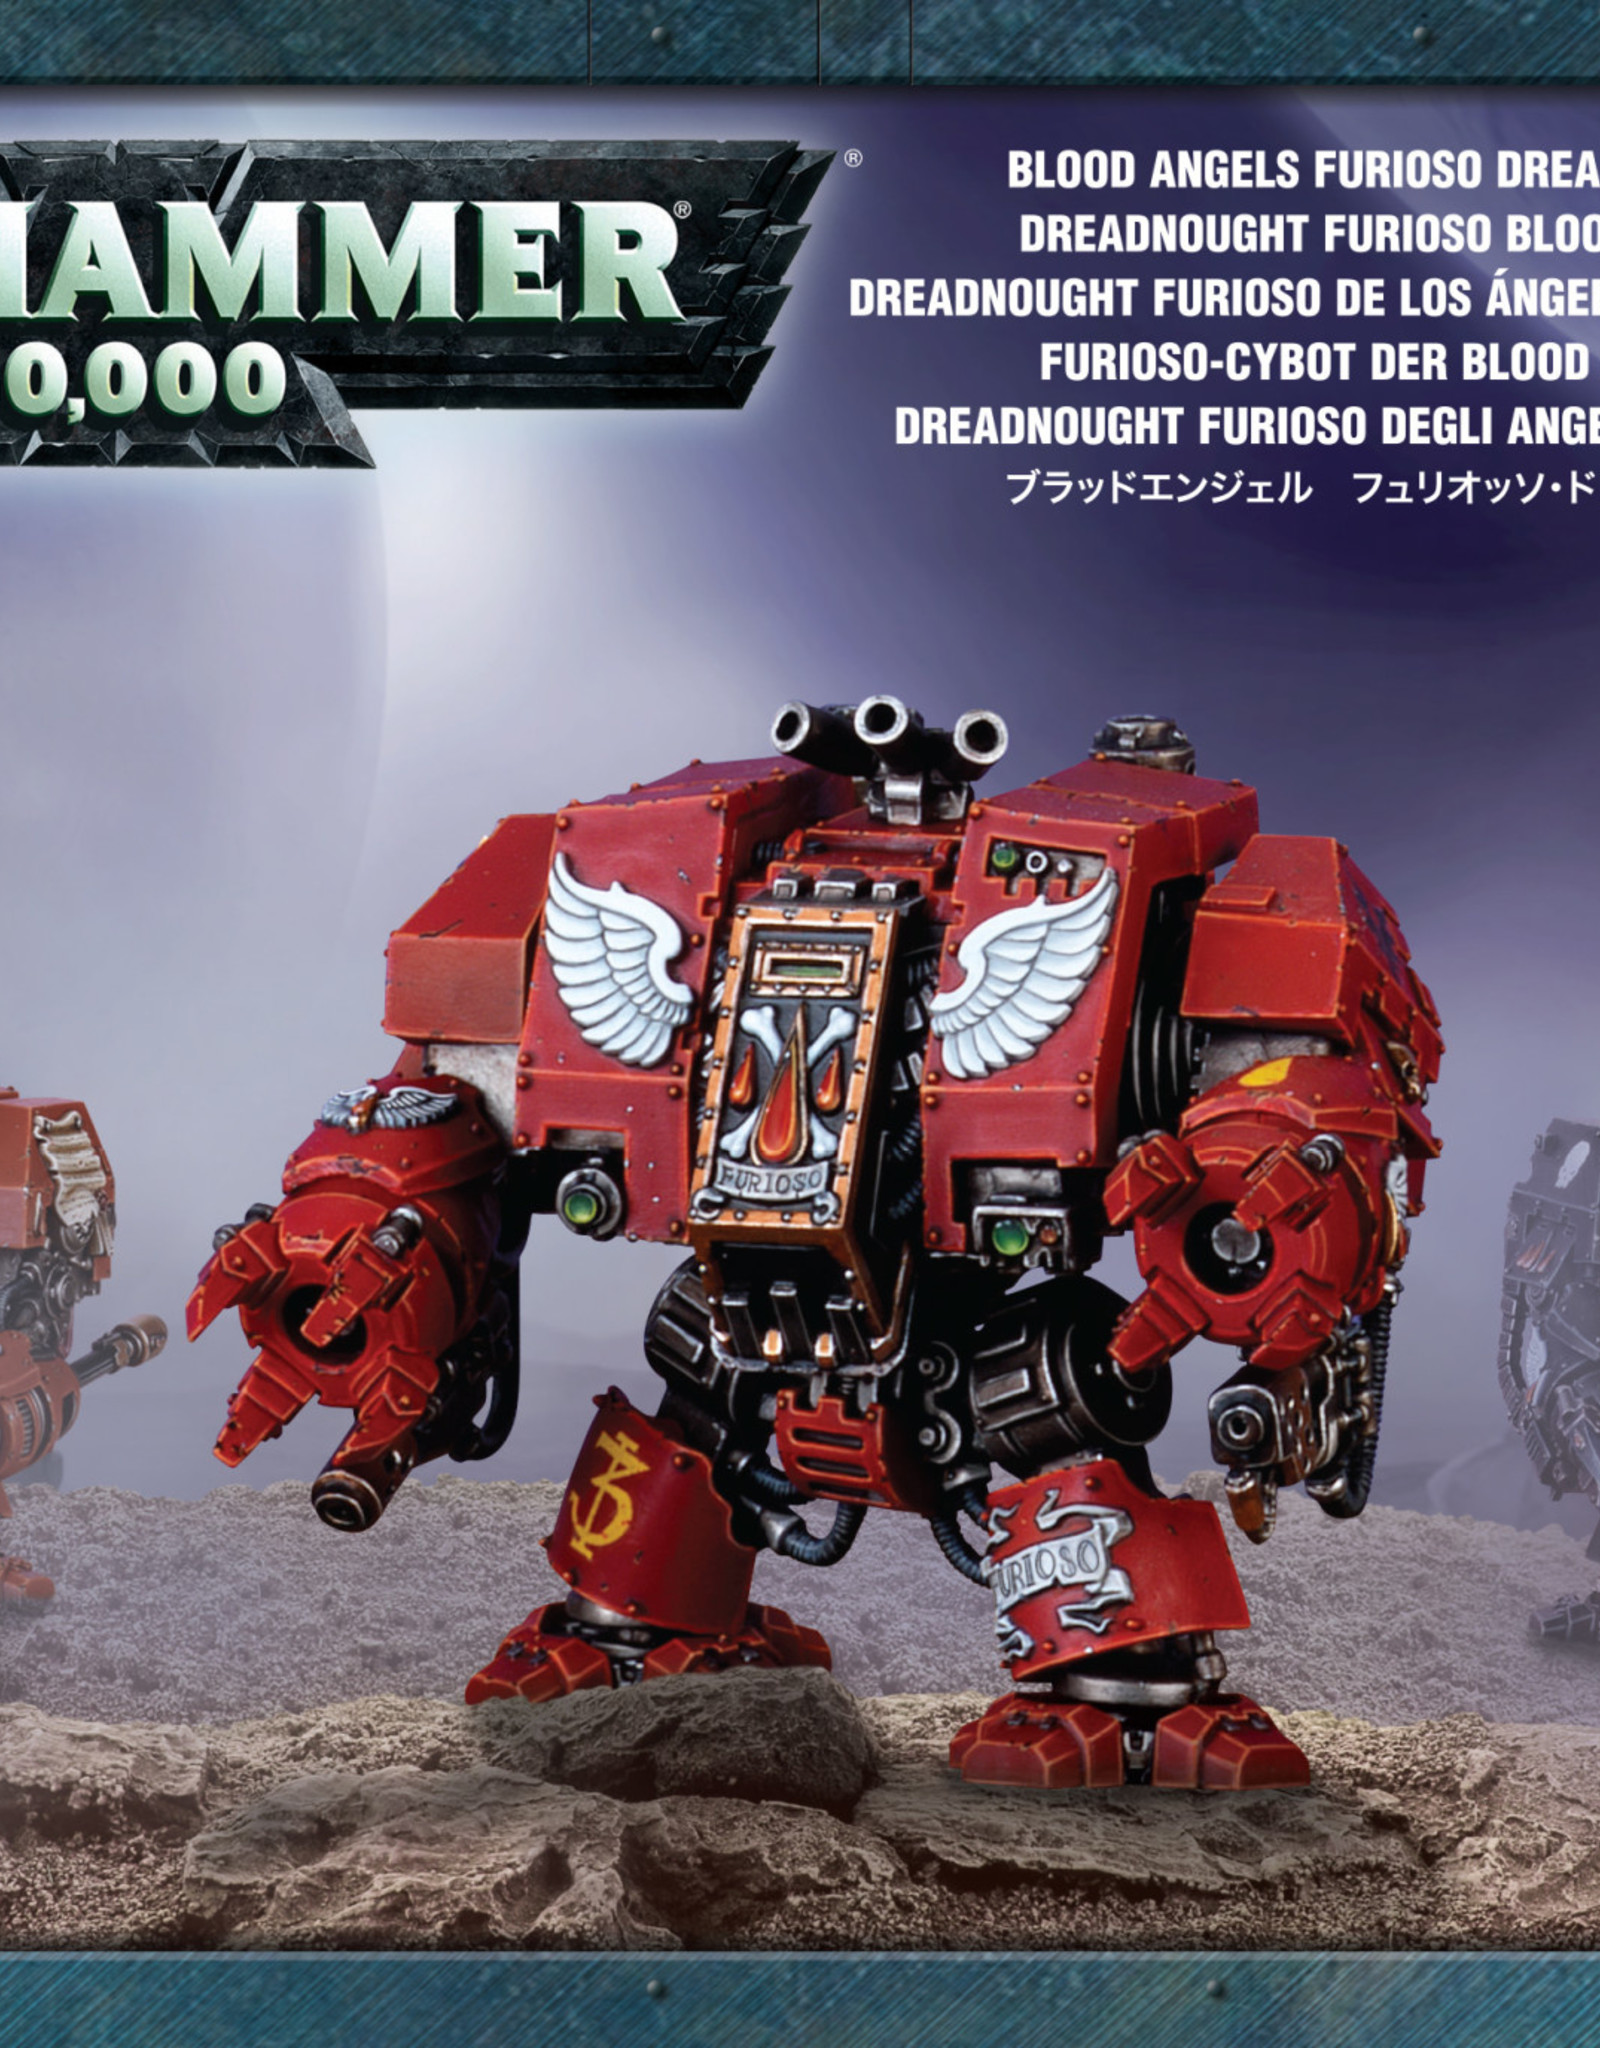 Warhammer 40K Blood Angels Furioso Dreadnought